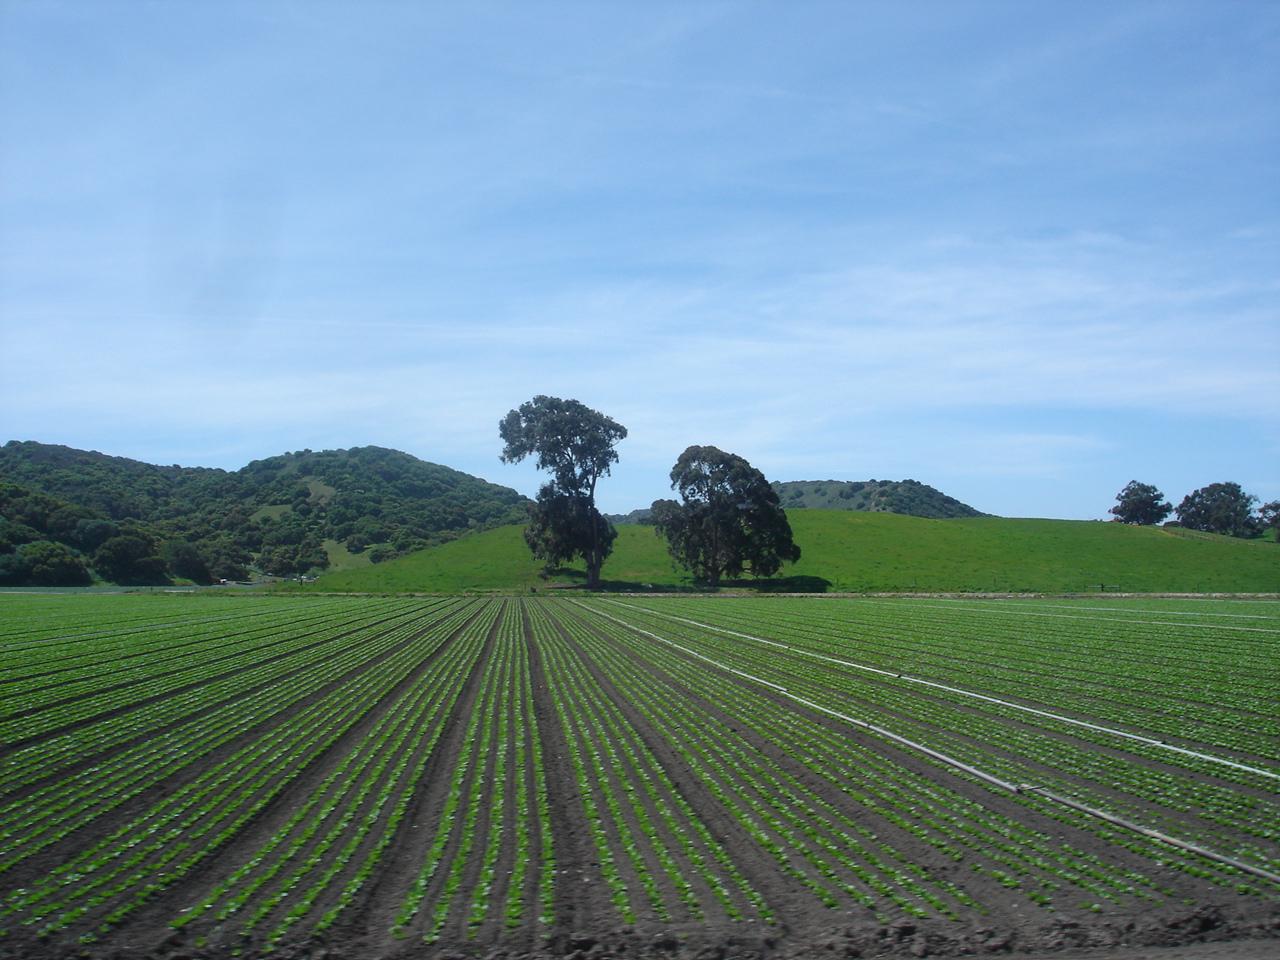 Greenfield_California.jpg